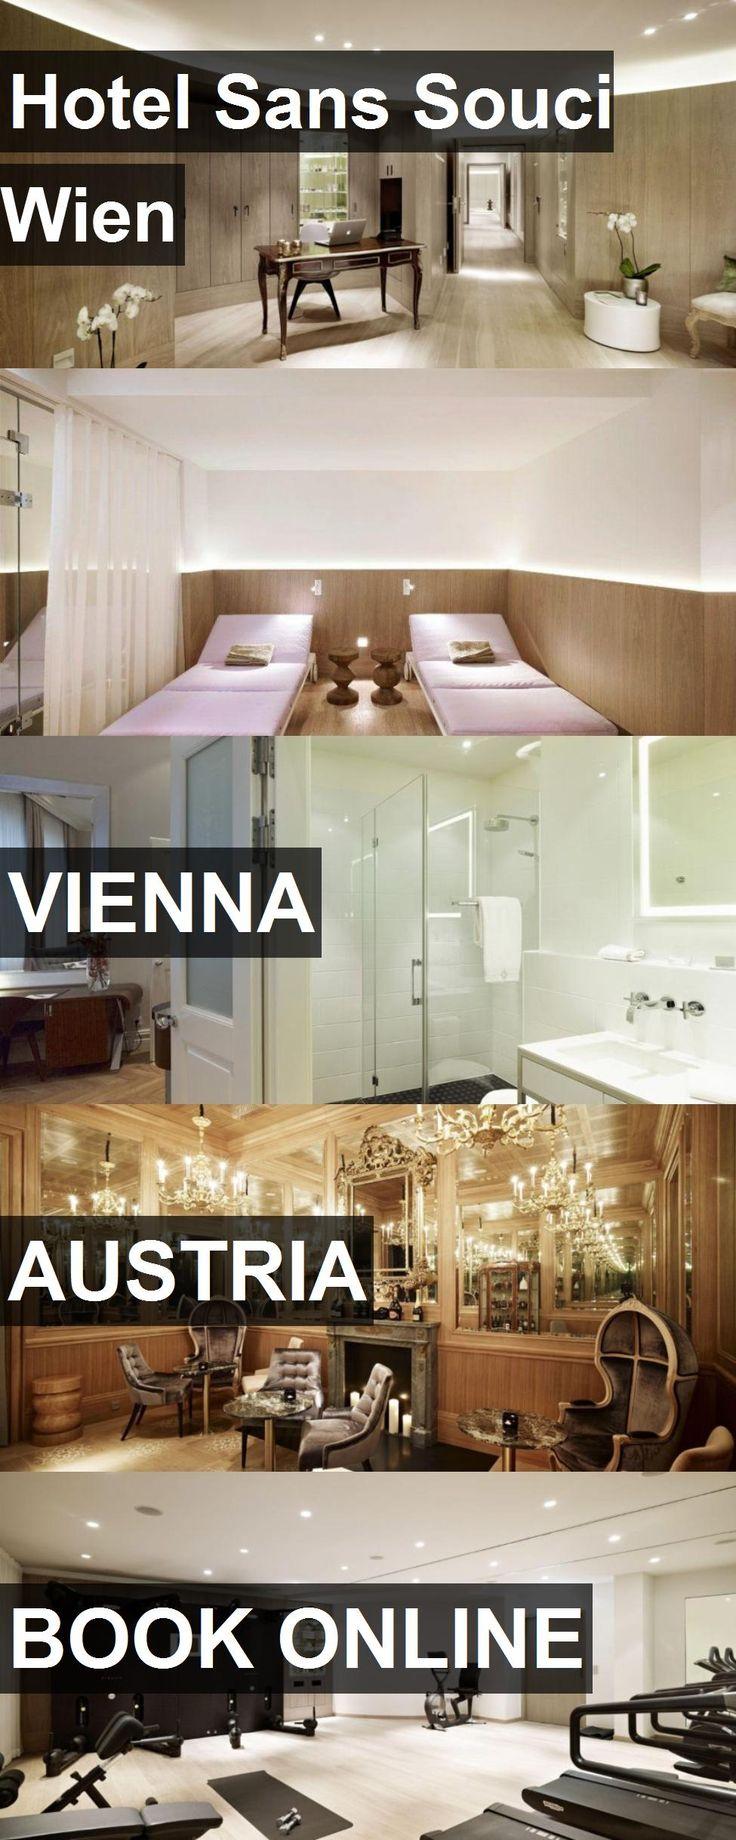 Hotel Hotel Sans Souci Wien in Vienna, Austria. For more information, photos, reviews and best prices please follow the link. #Austria #Vienna #HotelSansSouciWien #hotel #travel #vacation